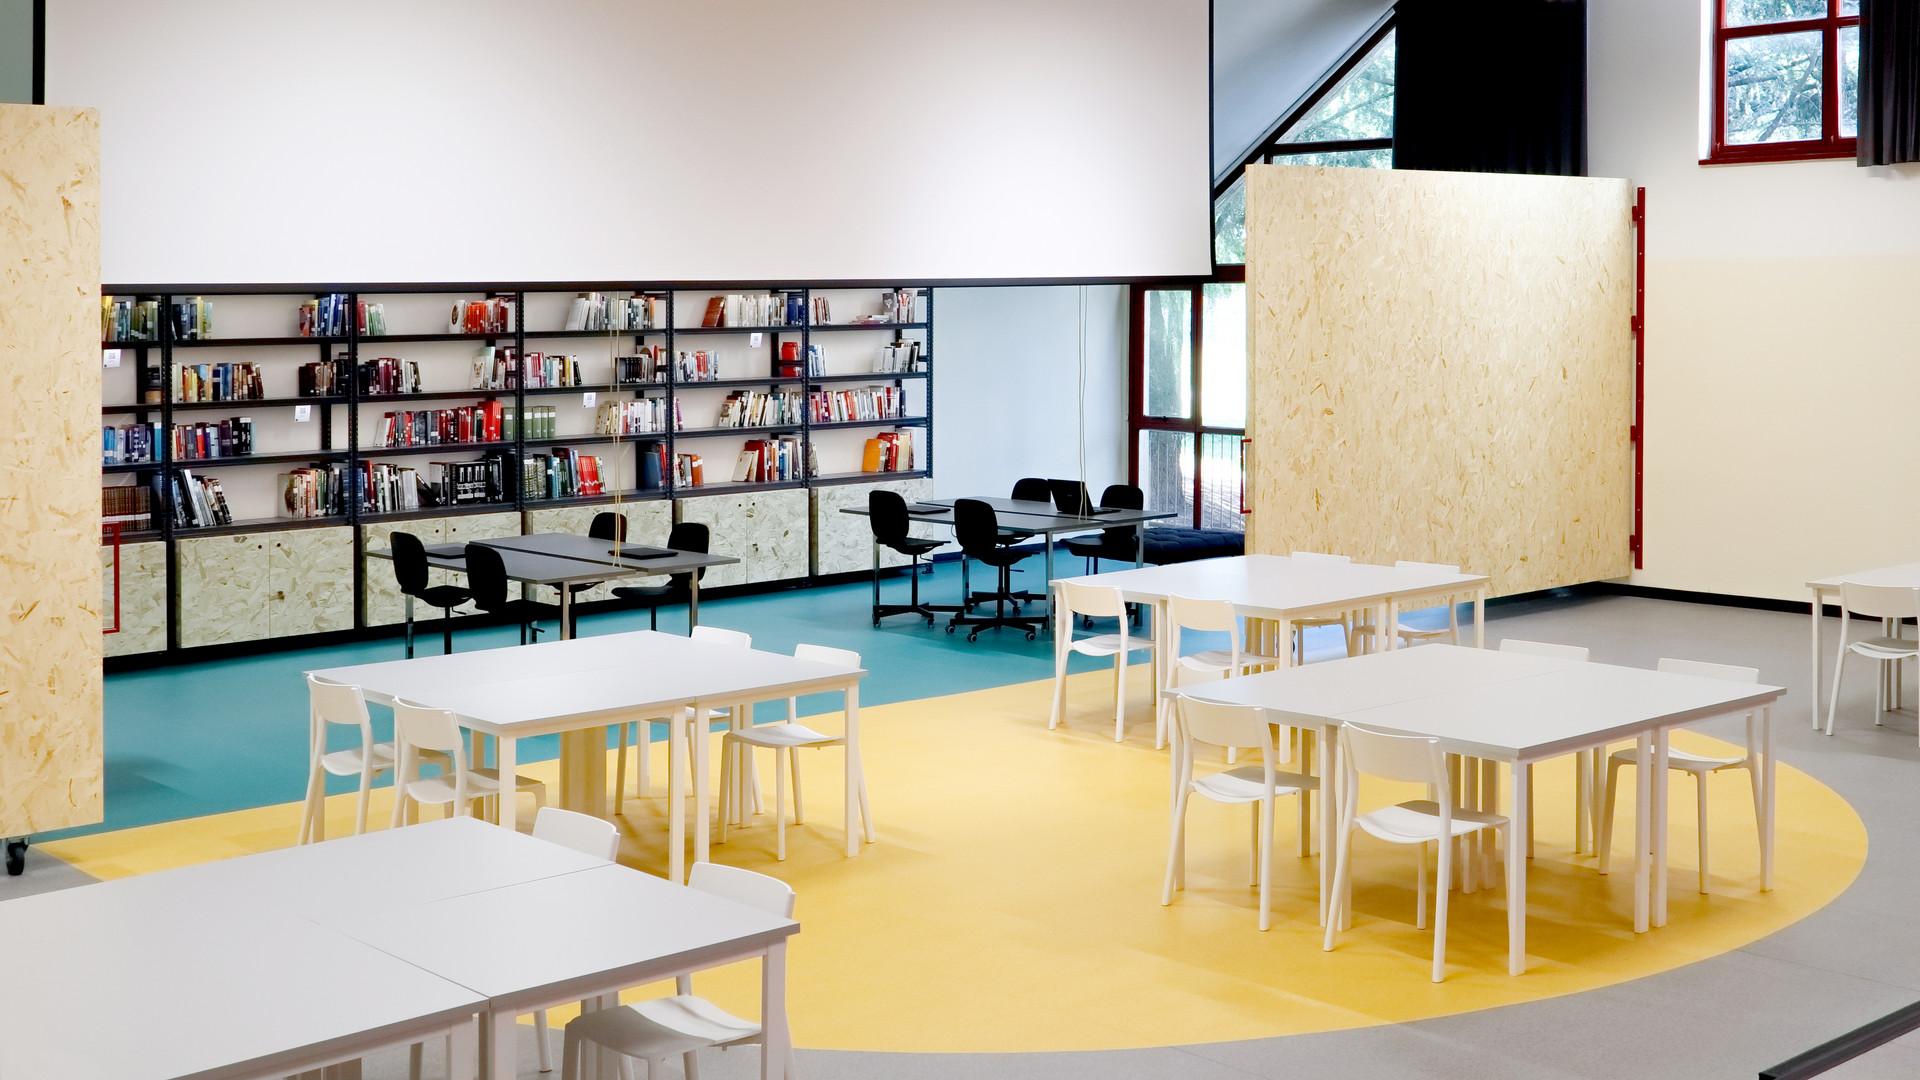 Bis- Biblioeca interattiva scolastica 09